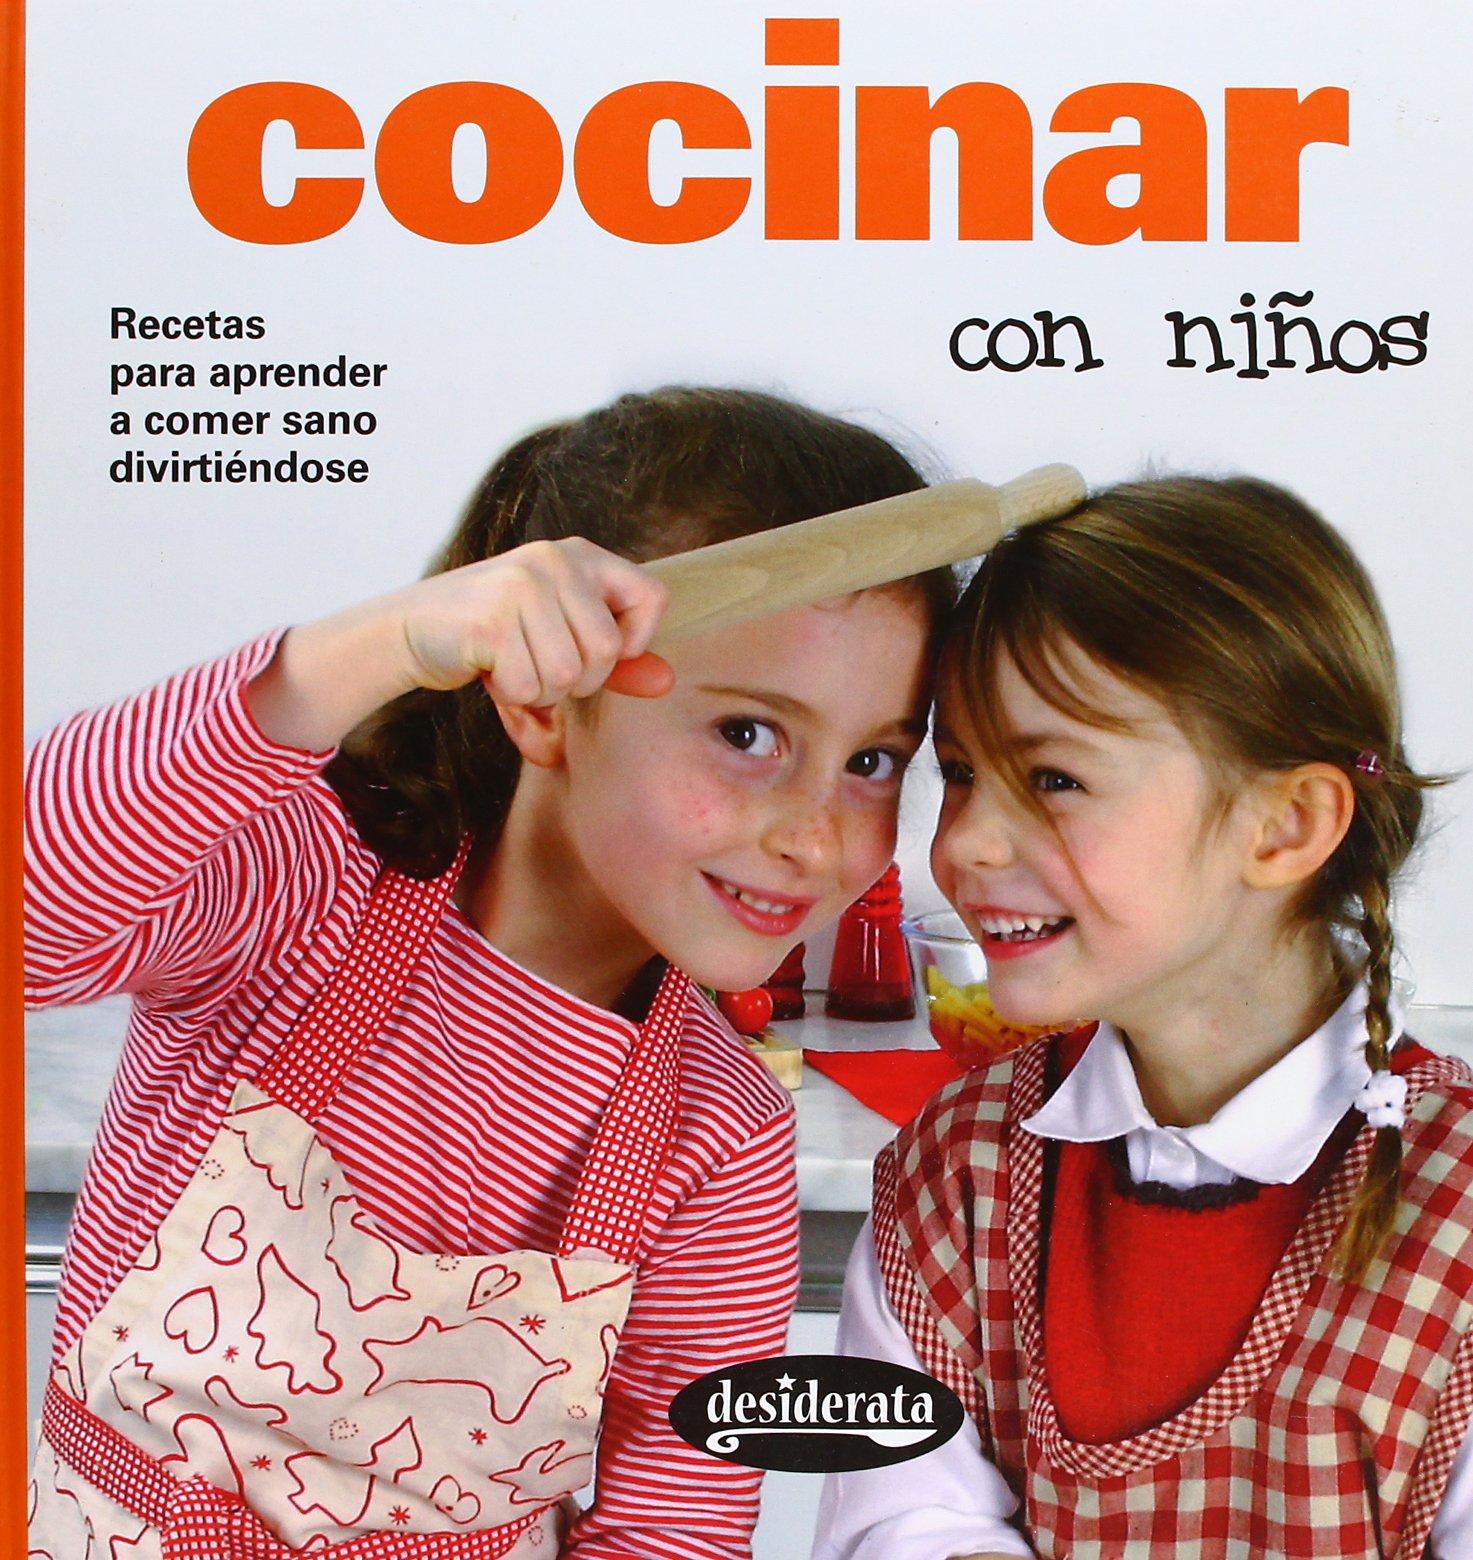 Recetas Para Aprender A Cocinar | Cocinar Con Ninos Recetas Para Aprender A Comer Sano